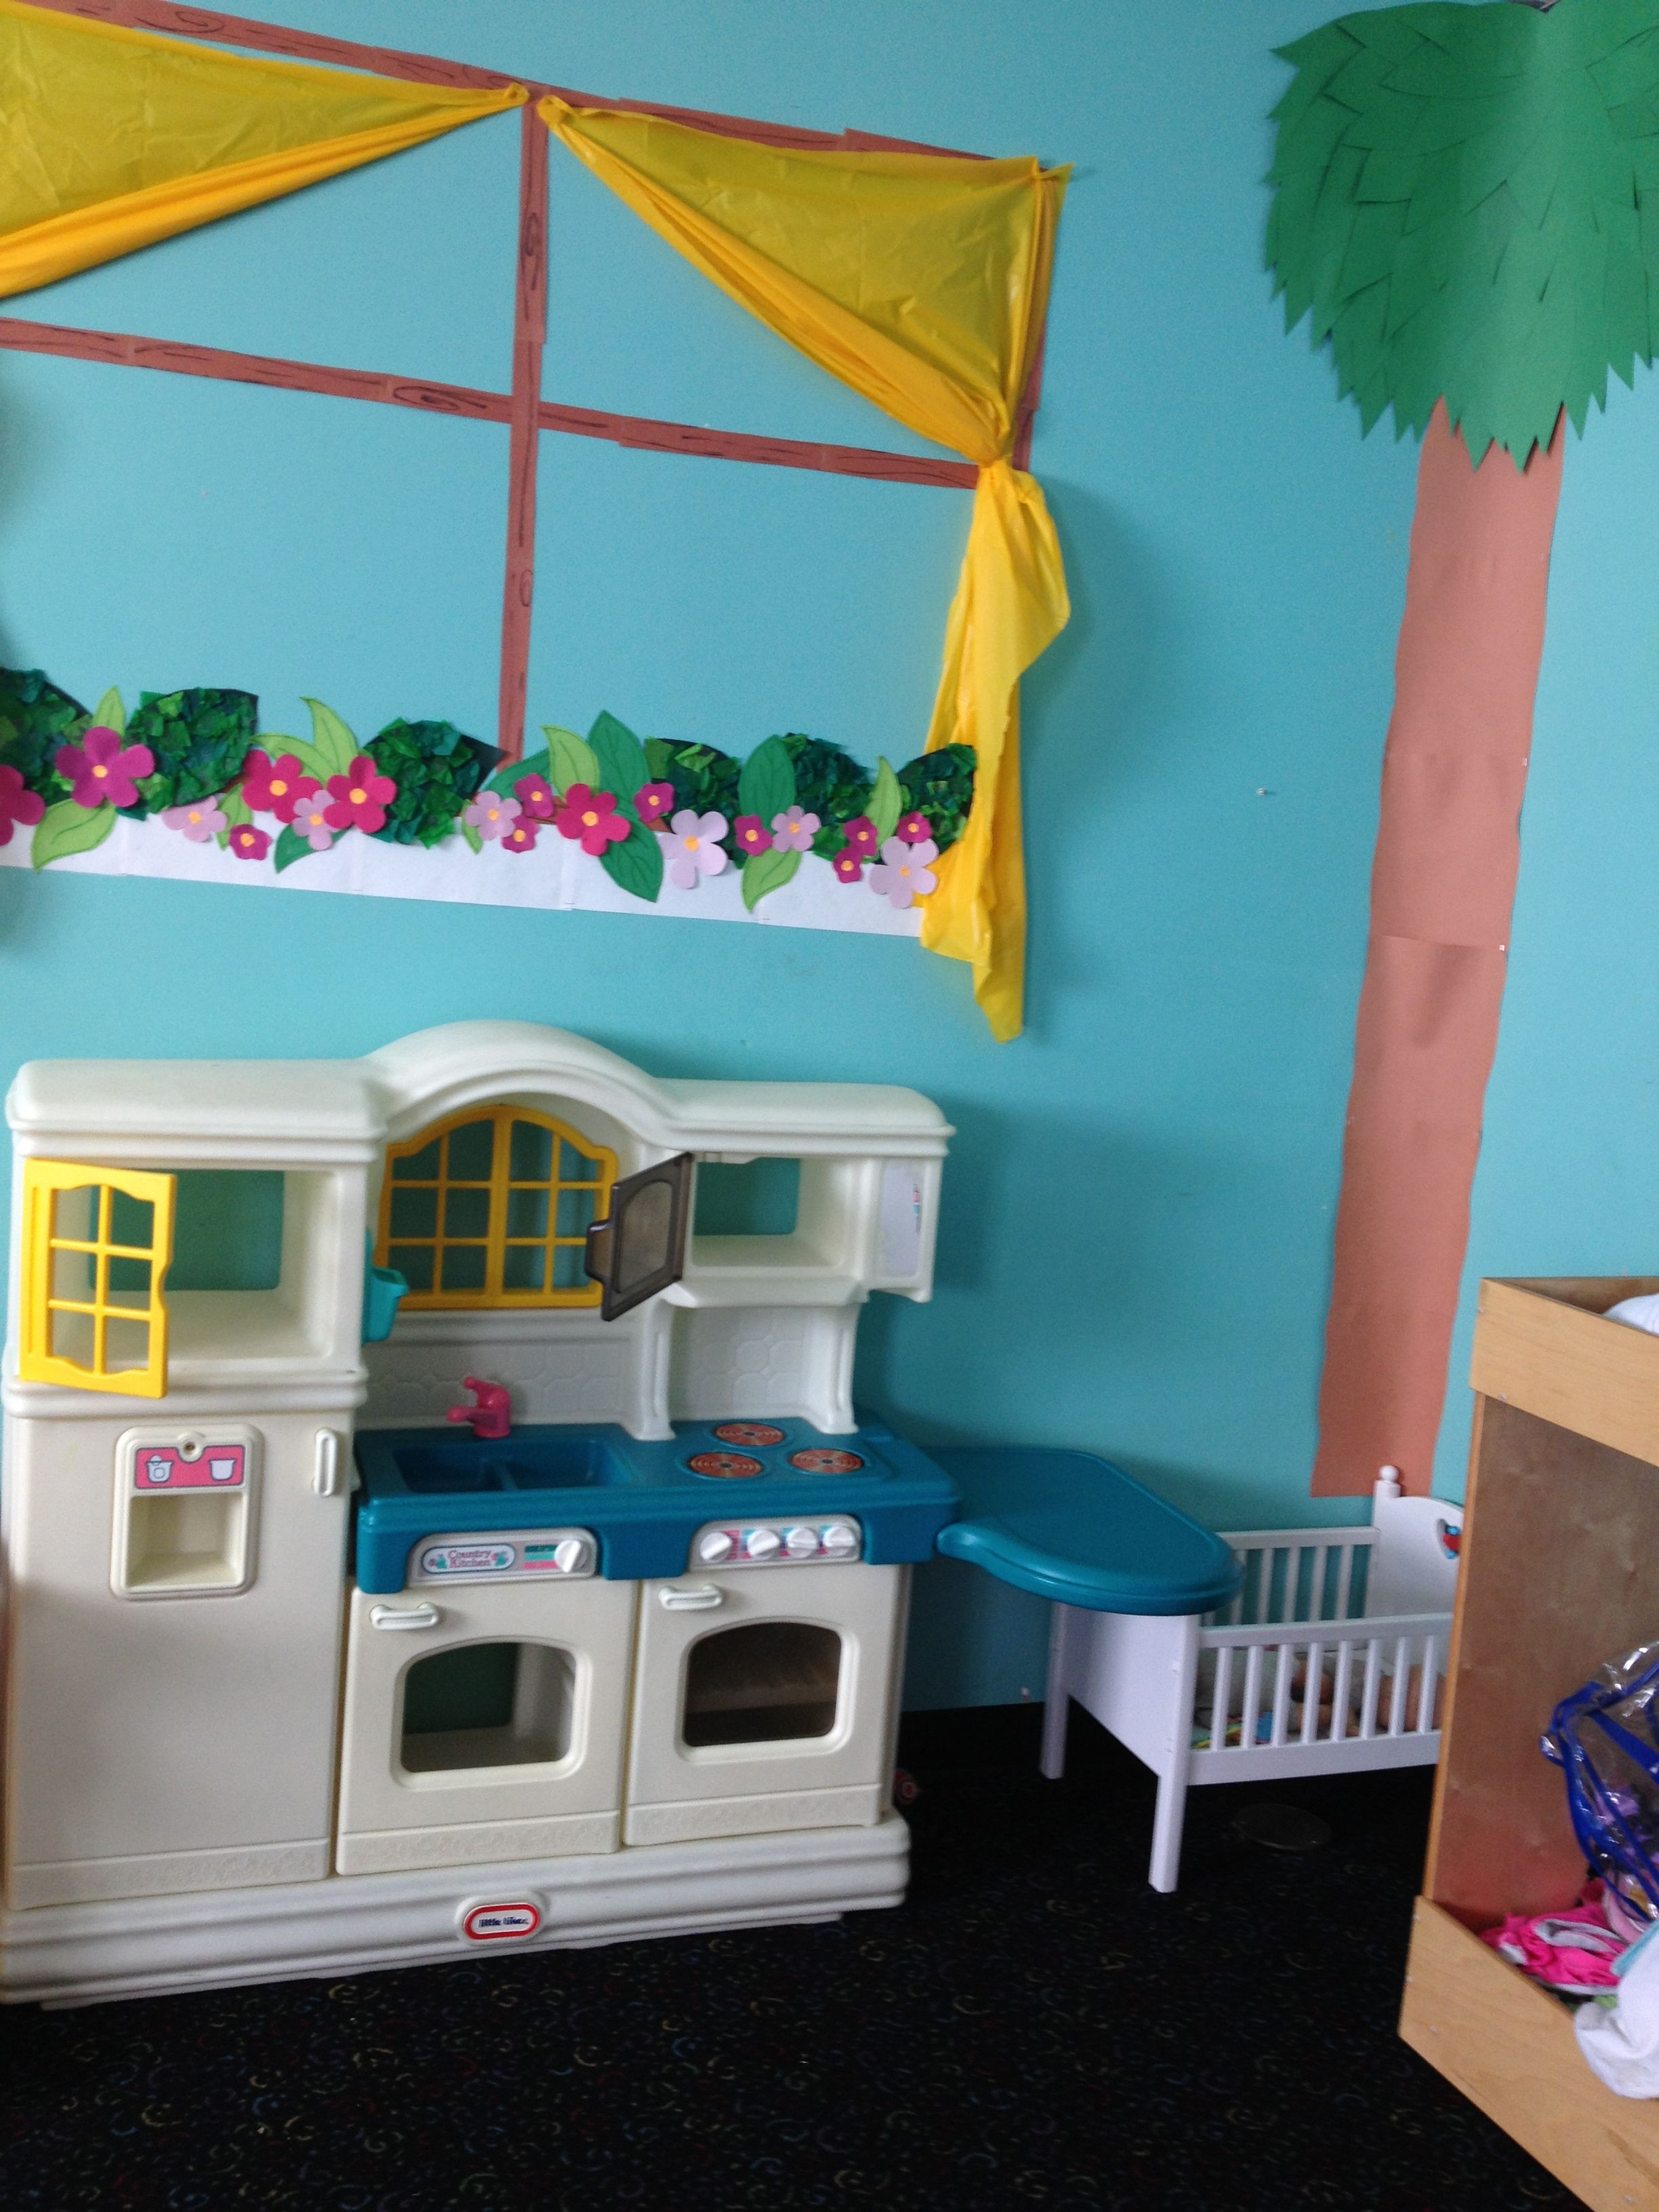 Preschool classroom creative dramatic play dress up house area ...